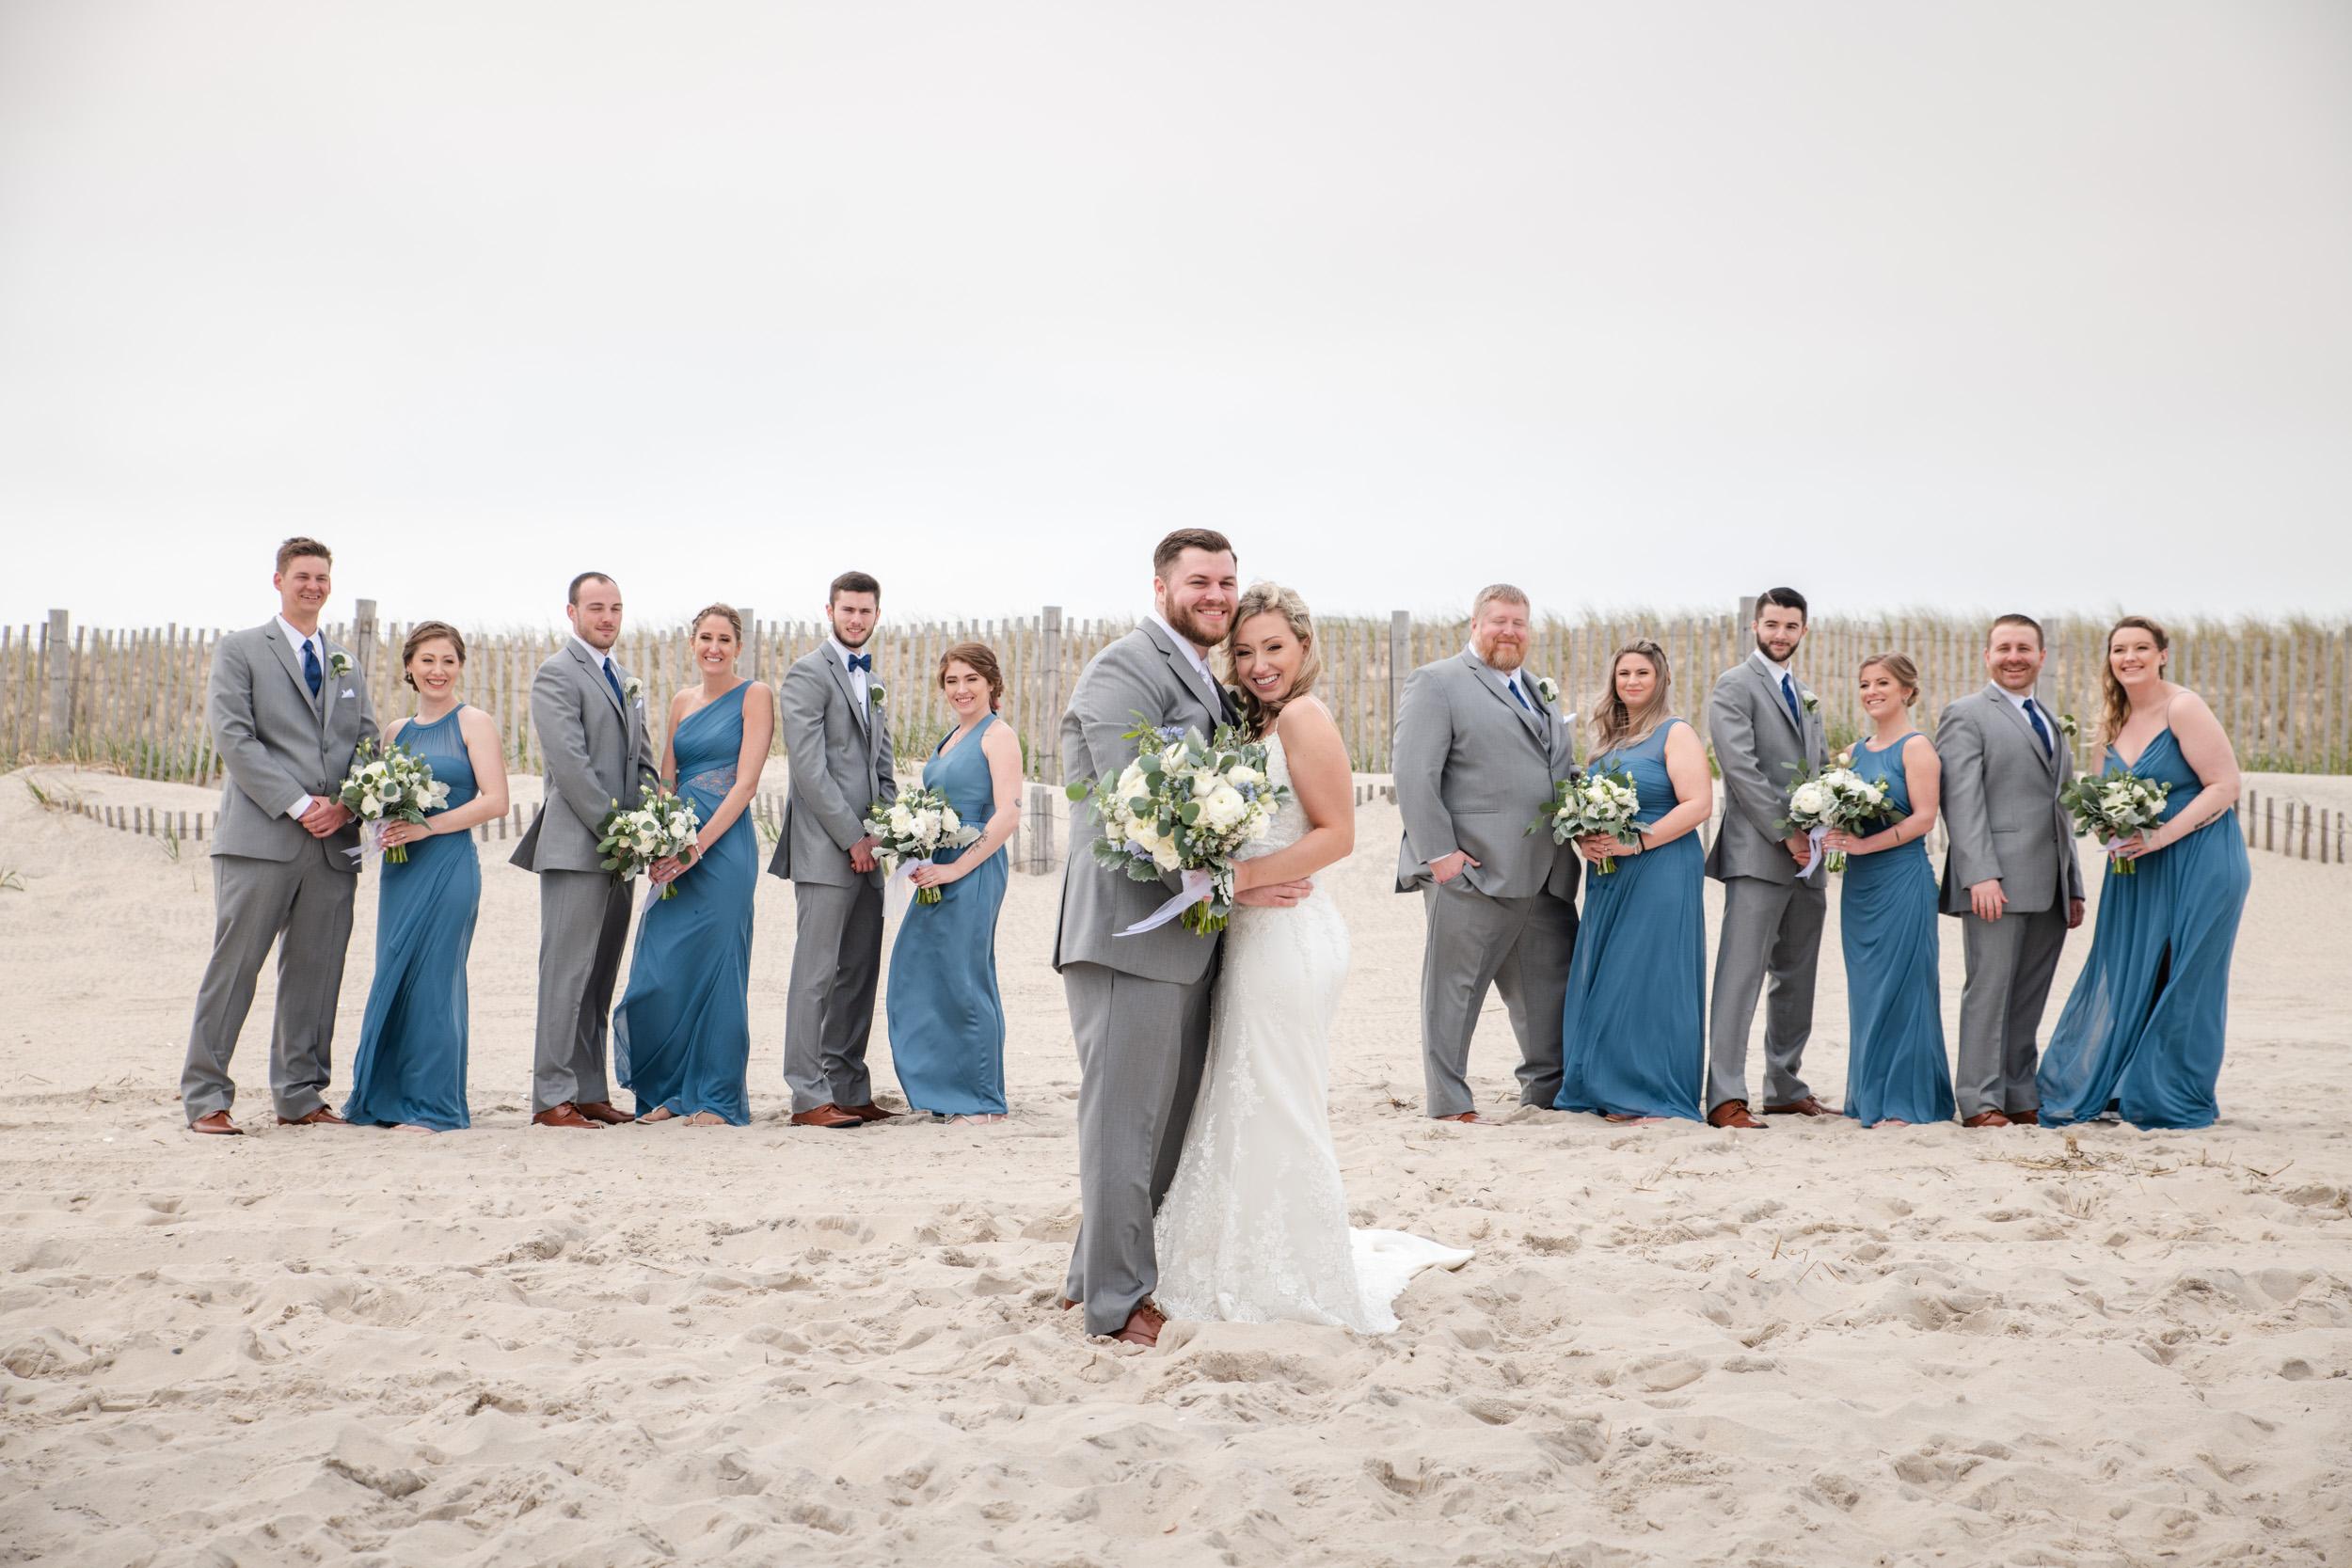 The Seashell Long Beach Island Bridal Party Photos